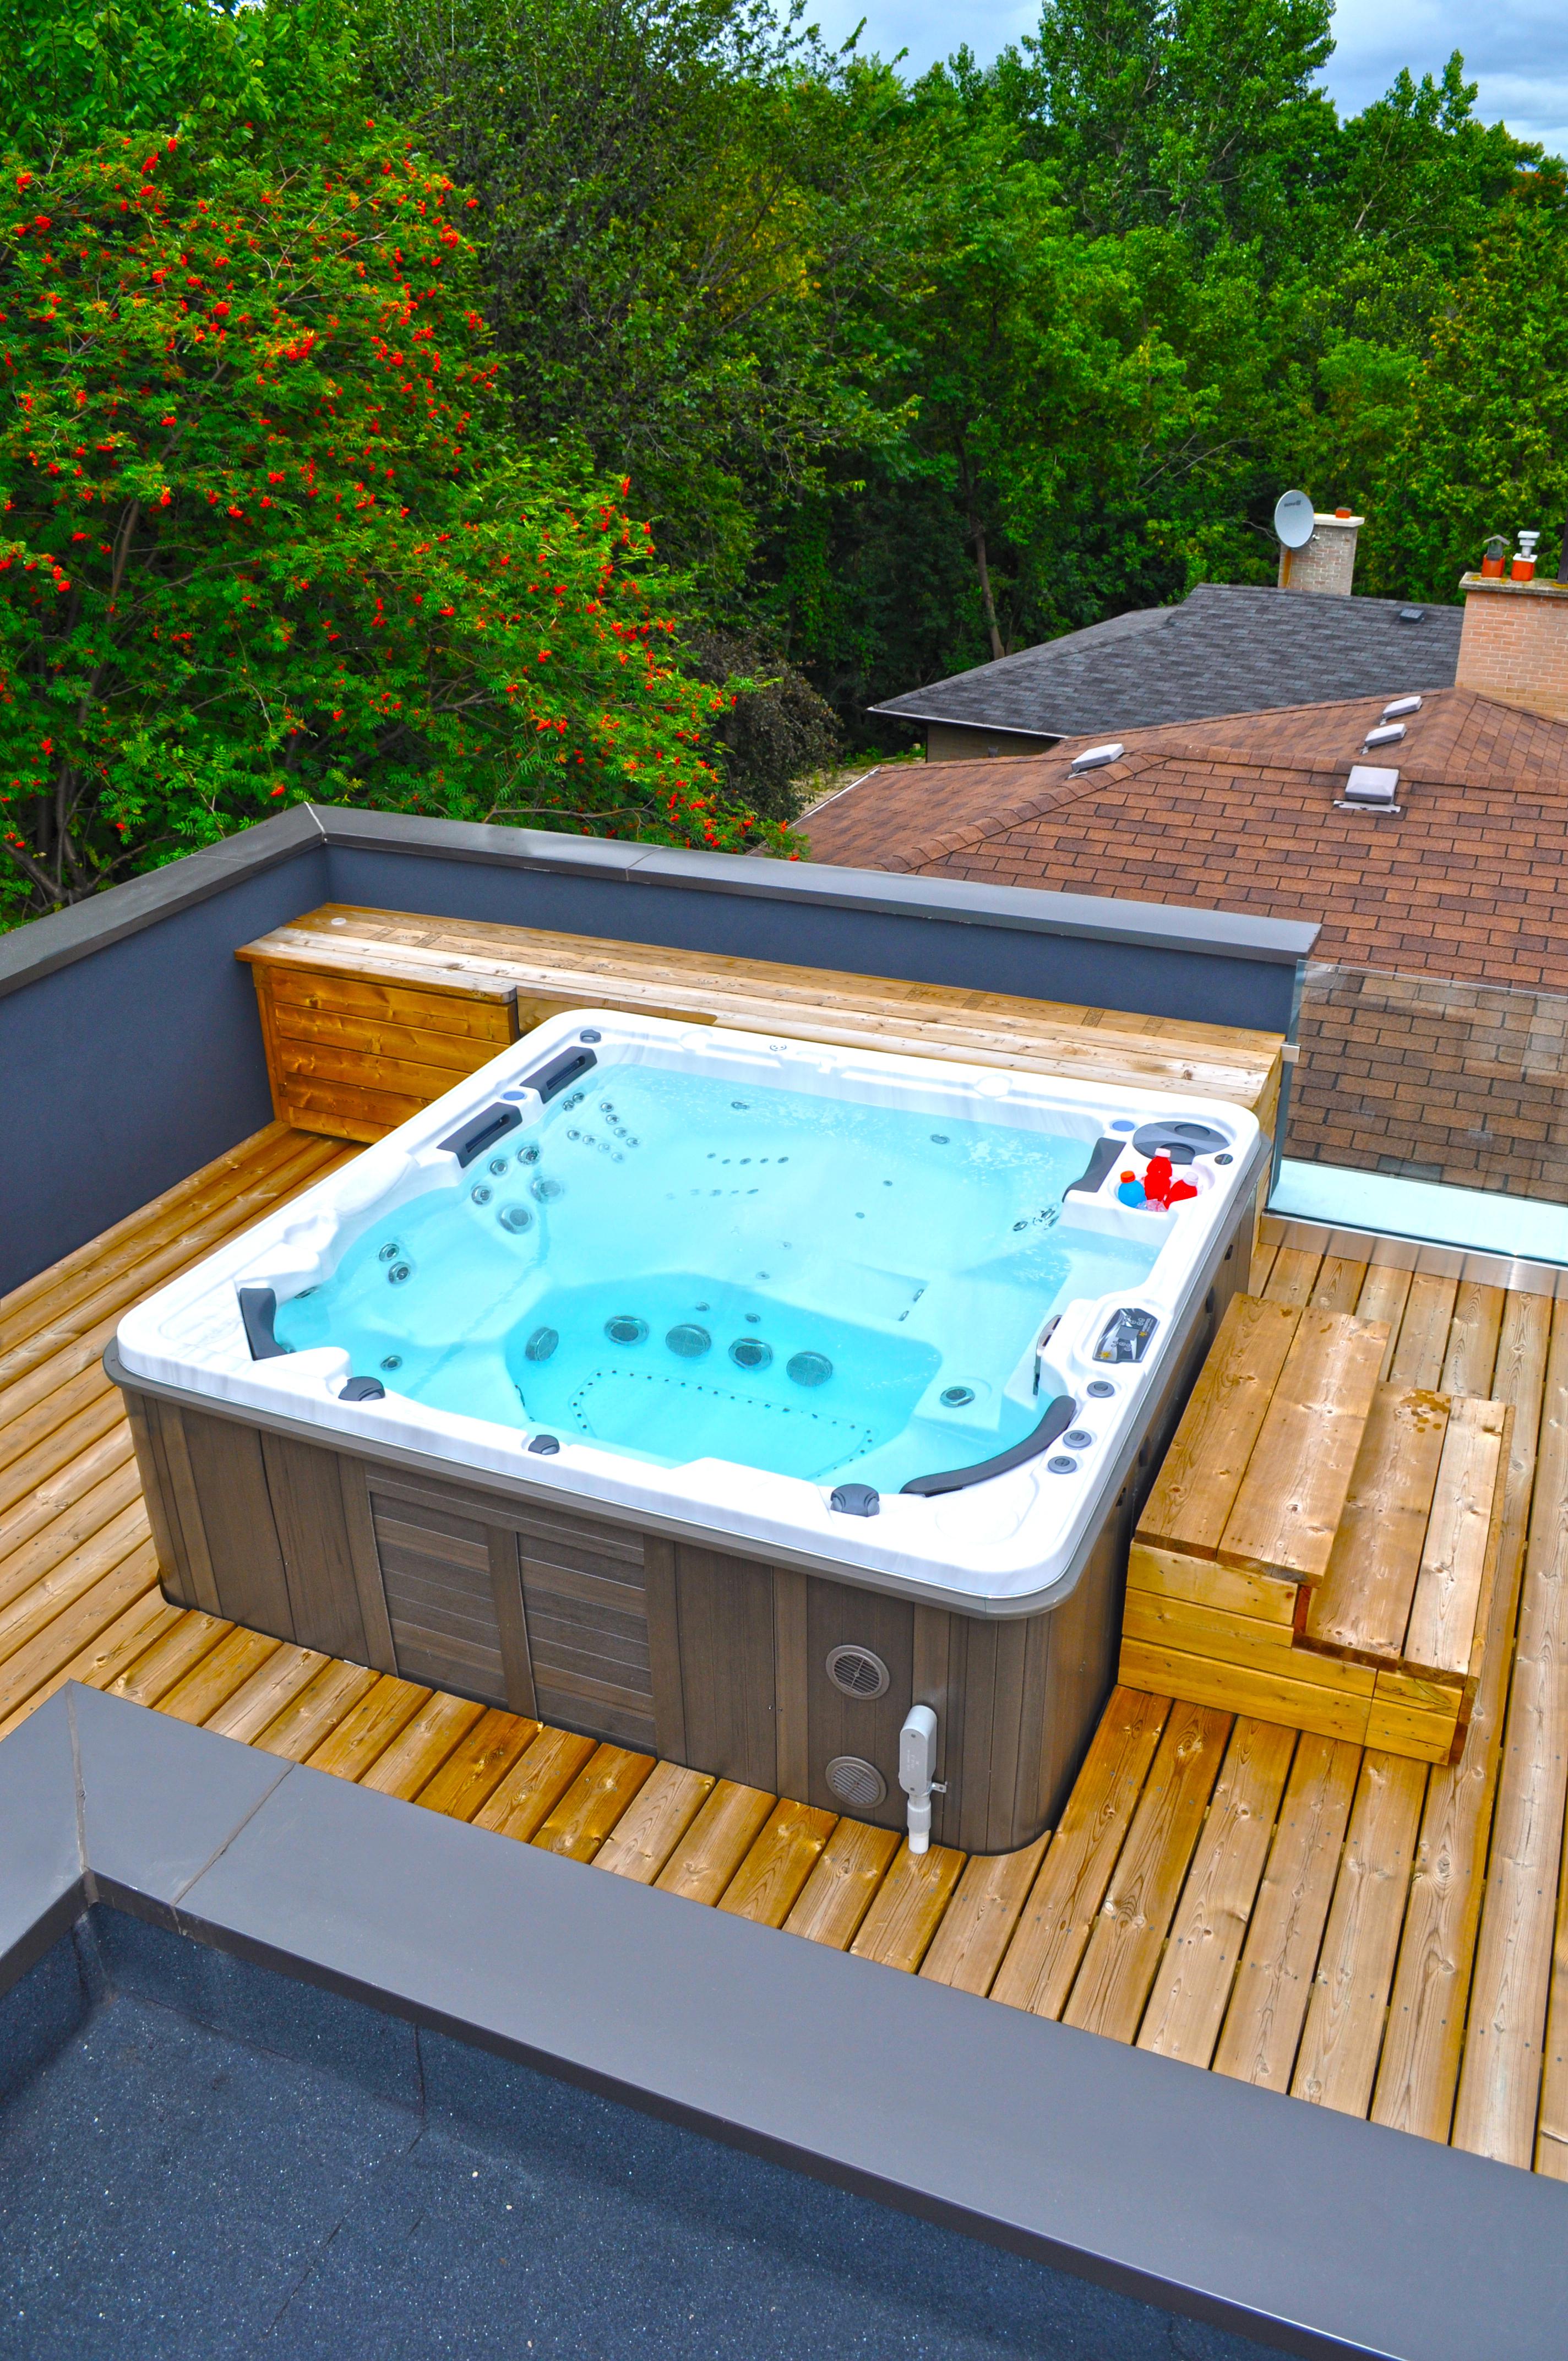 Self Cleaning Hydropool Hot Tub